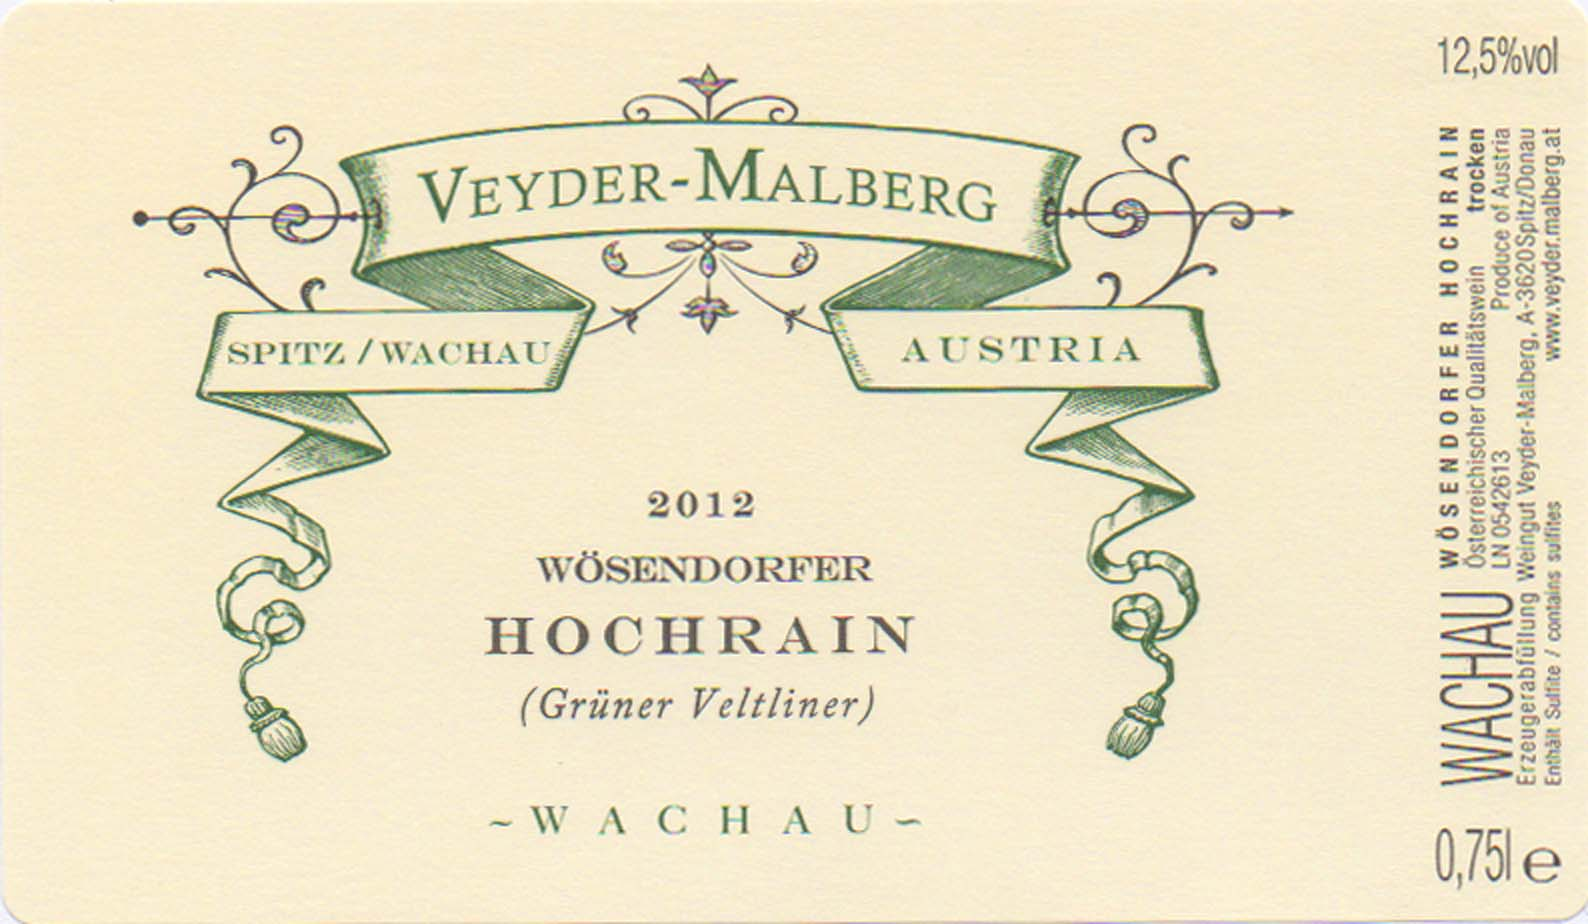 Peter Veyder-Malberg